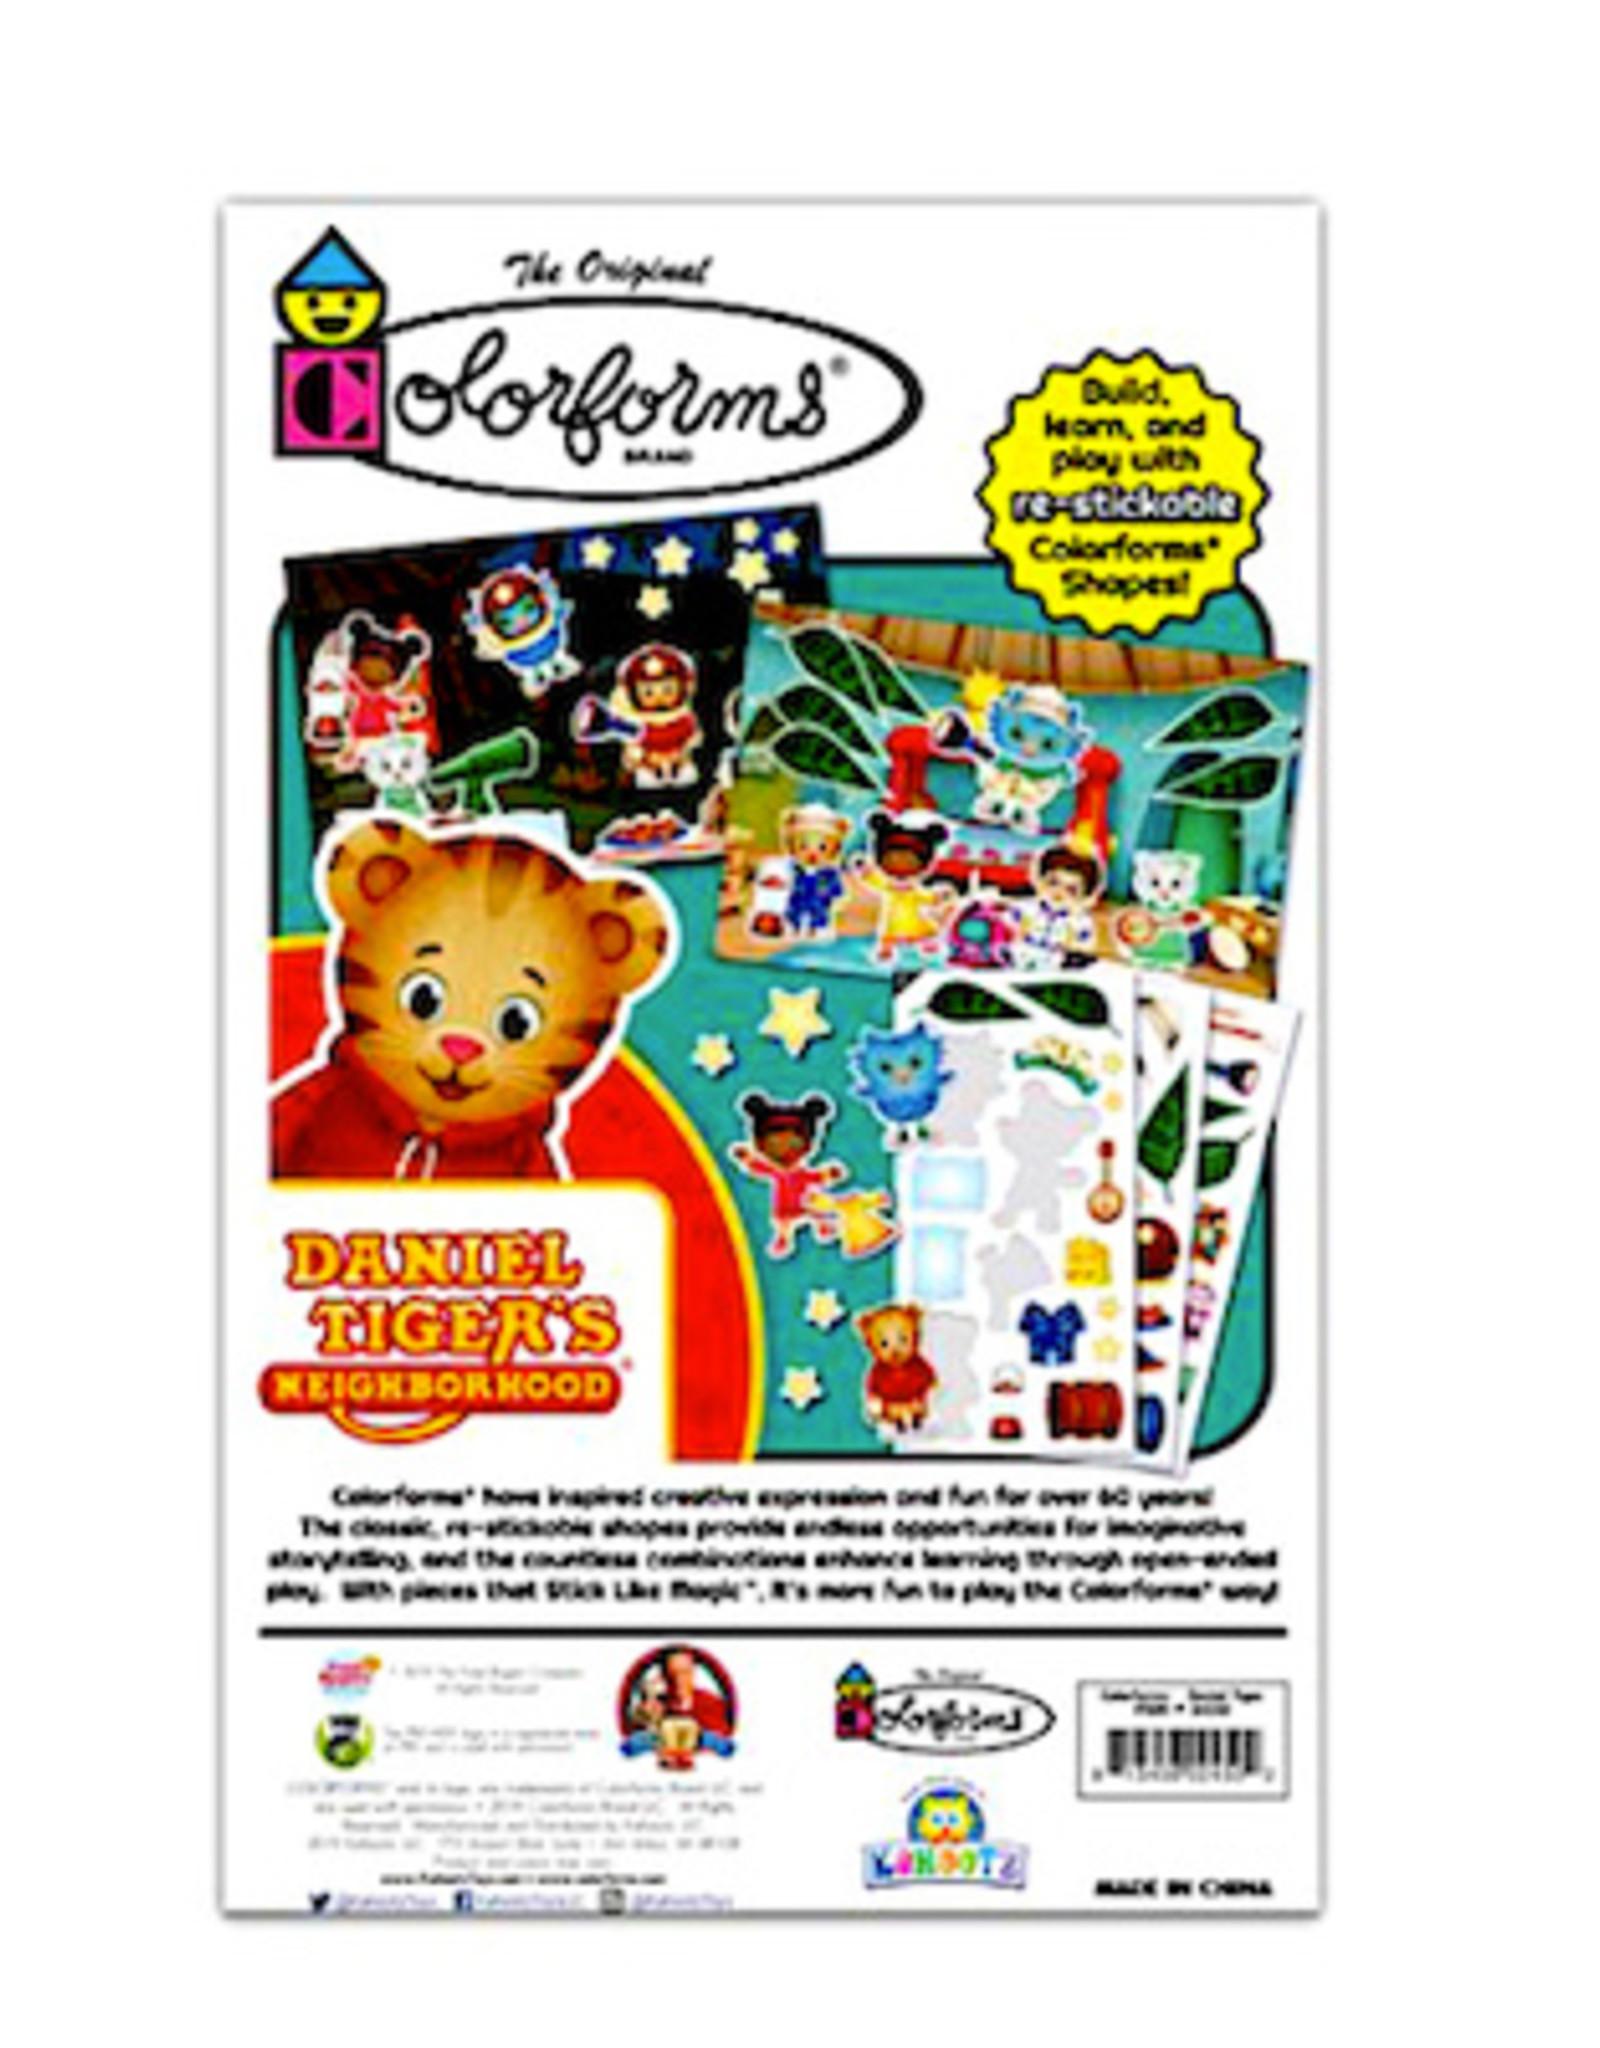 Colorforms Licensed Picture Play Set- Daniel Tiger